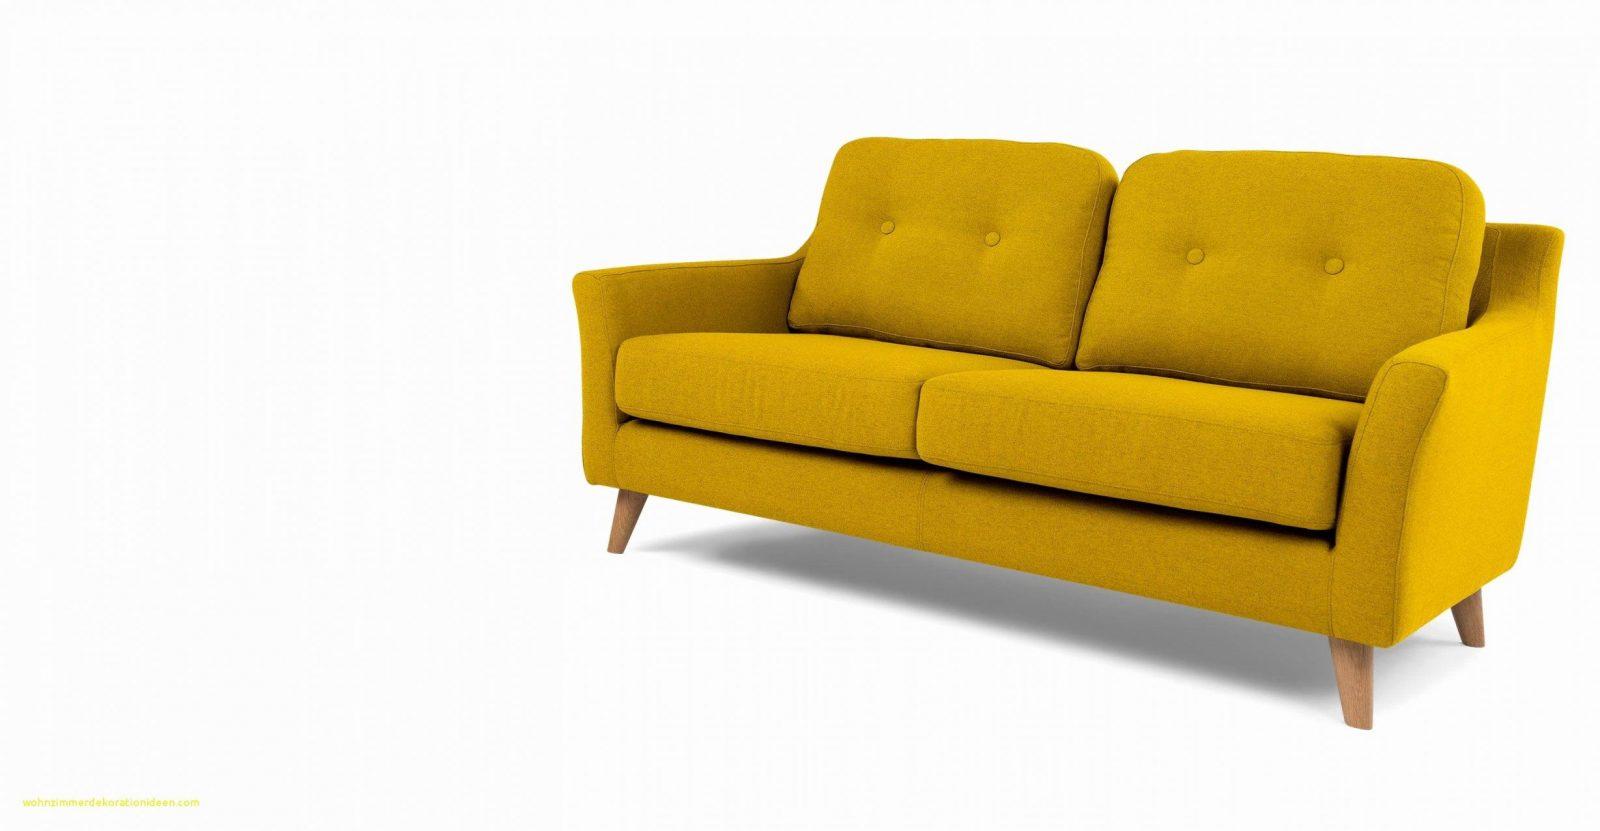 Top Ergebnis Sofa Otto Elegant Fine 2 Sitzer Sofas Rufus 2 Sitzer von Otto 2 Sitzer Sofa Bild